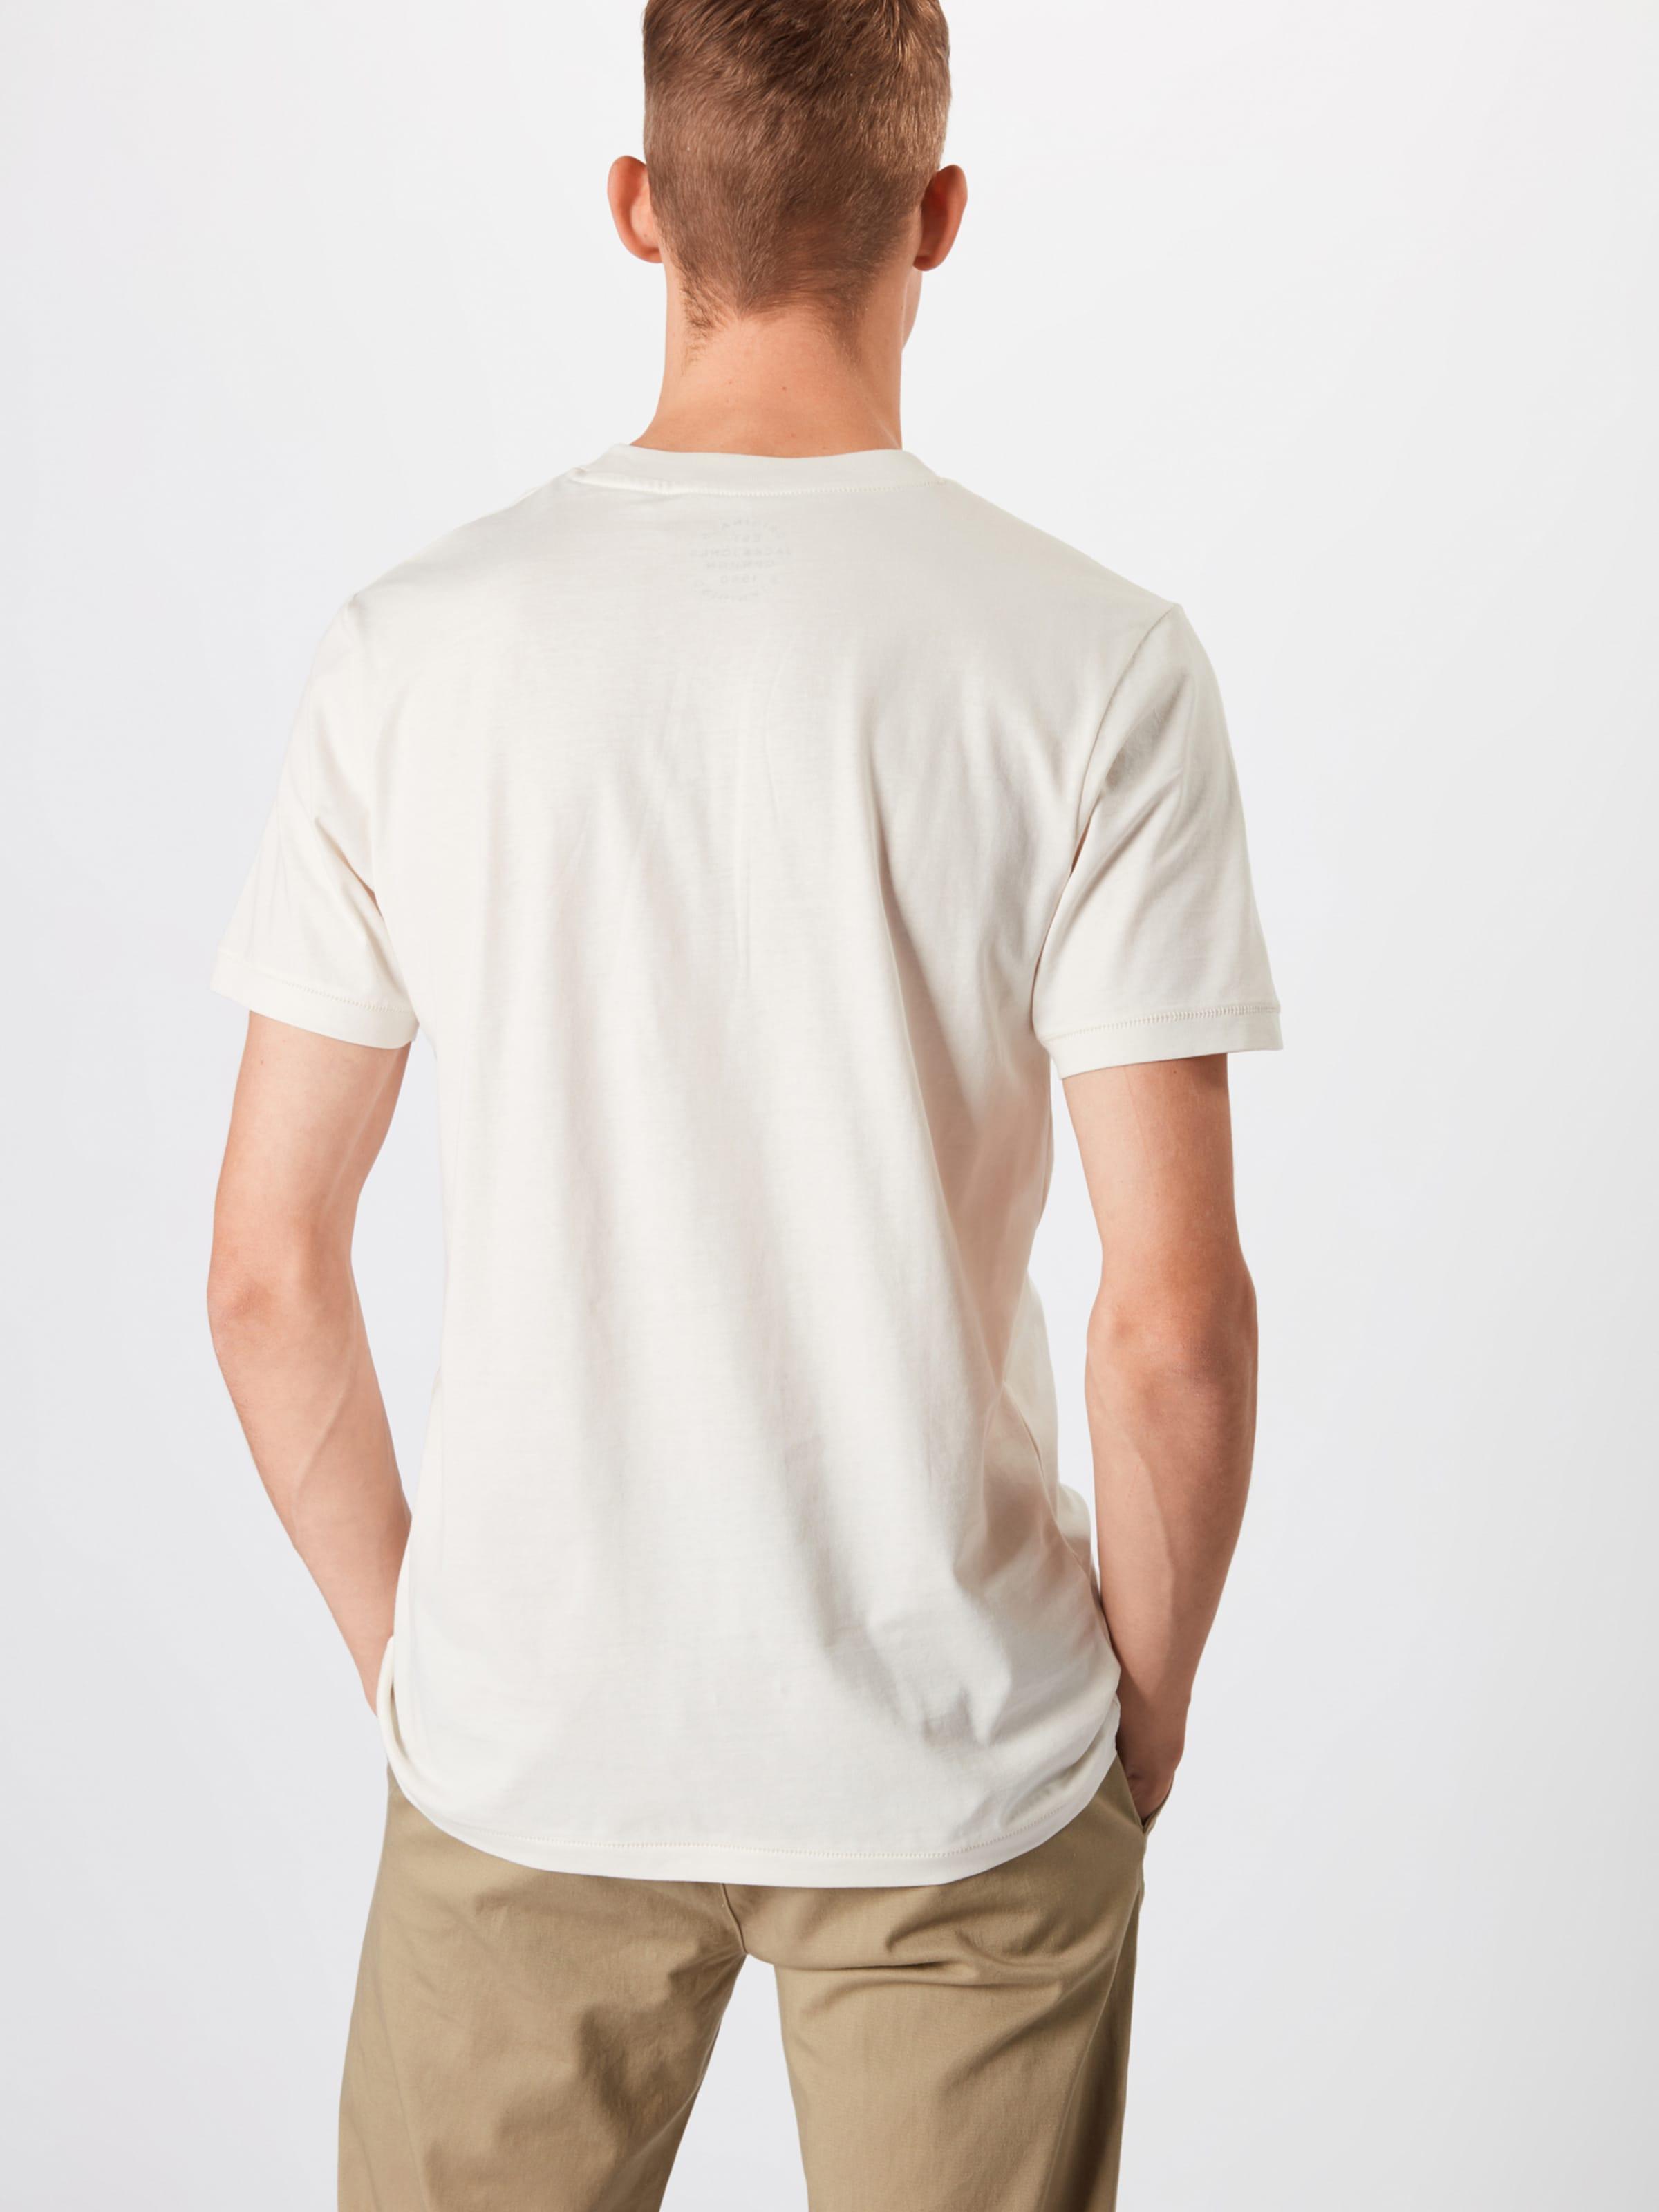 En Bleu Jackamp; T Blanc Jones shirt MarineJaune DHIe2YWE9b